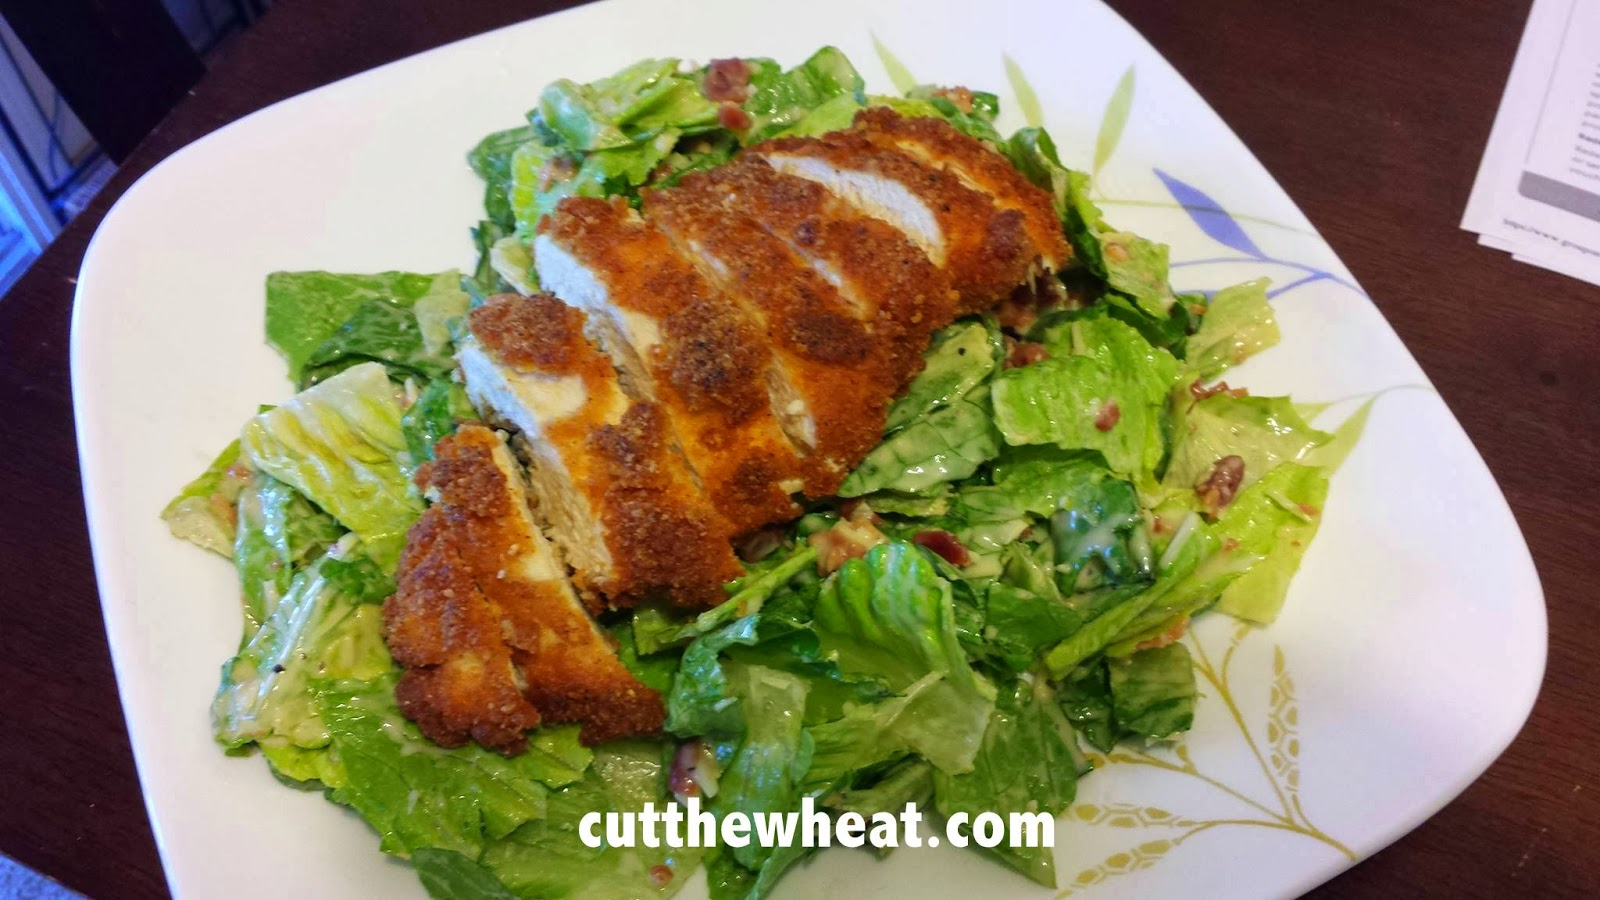 Frying skinless chicken breast